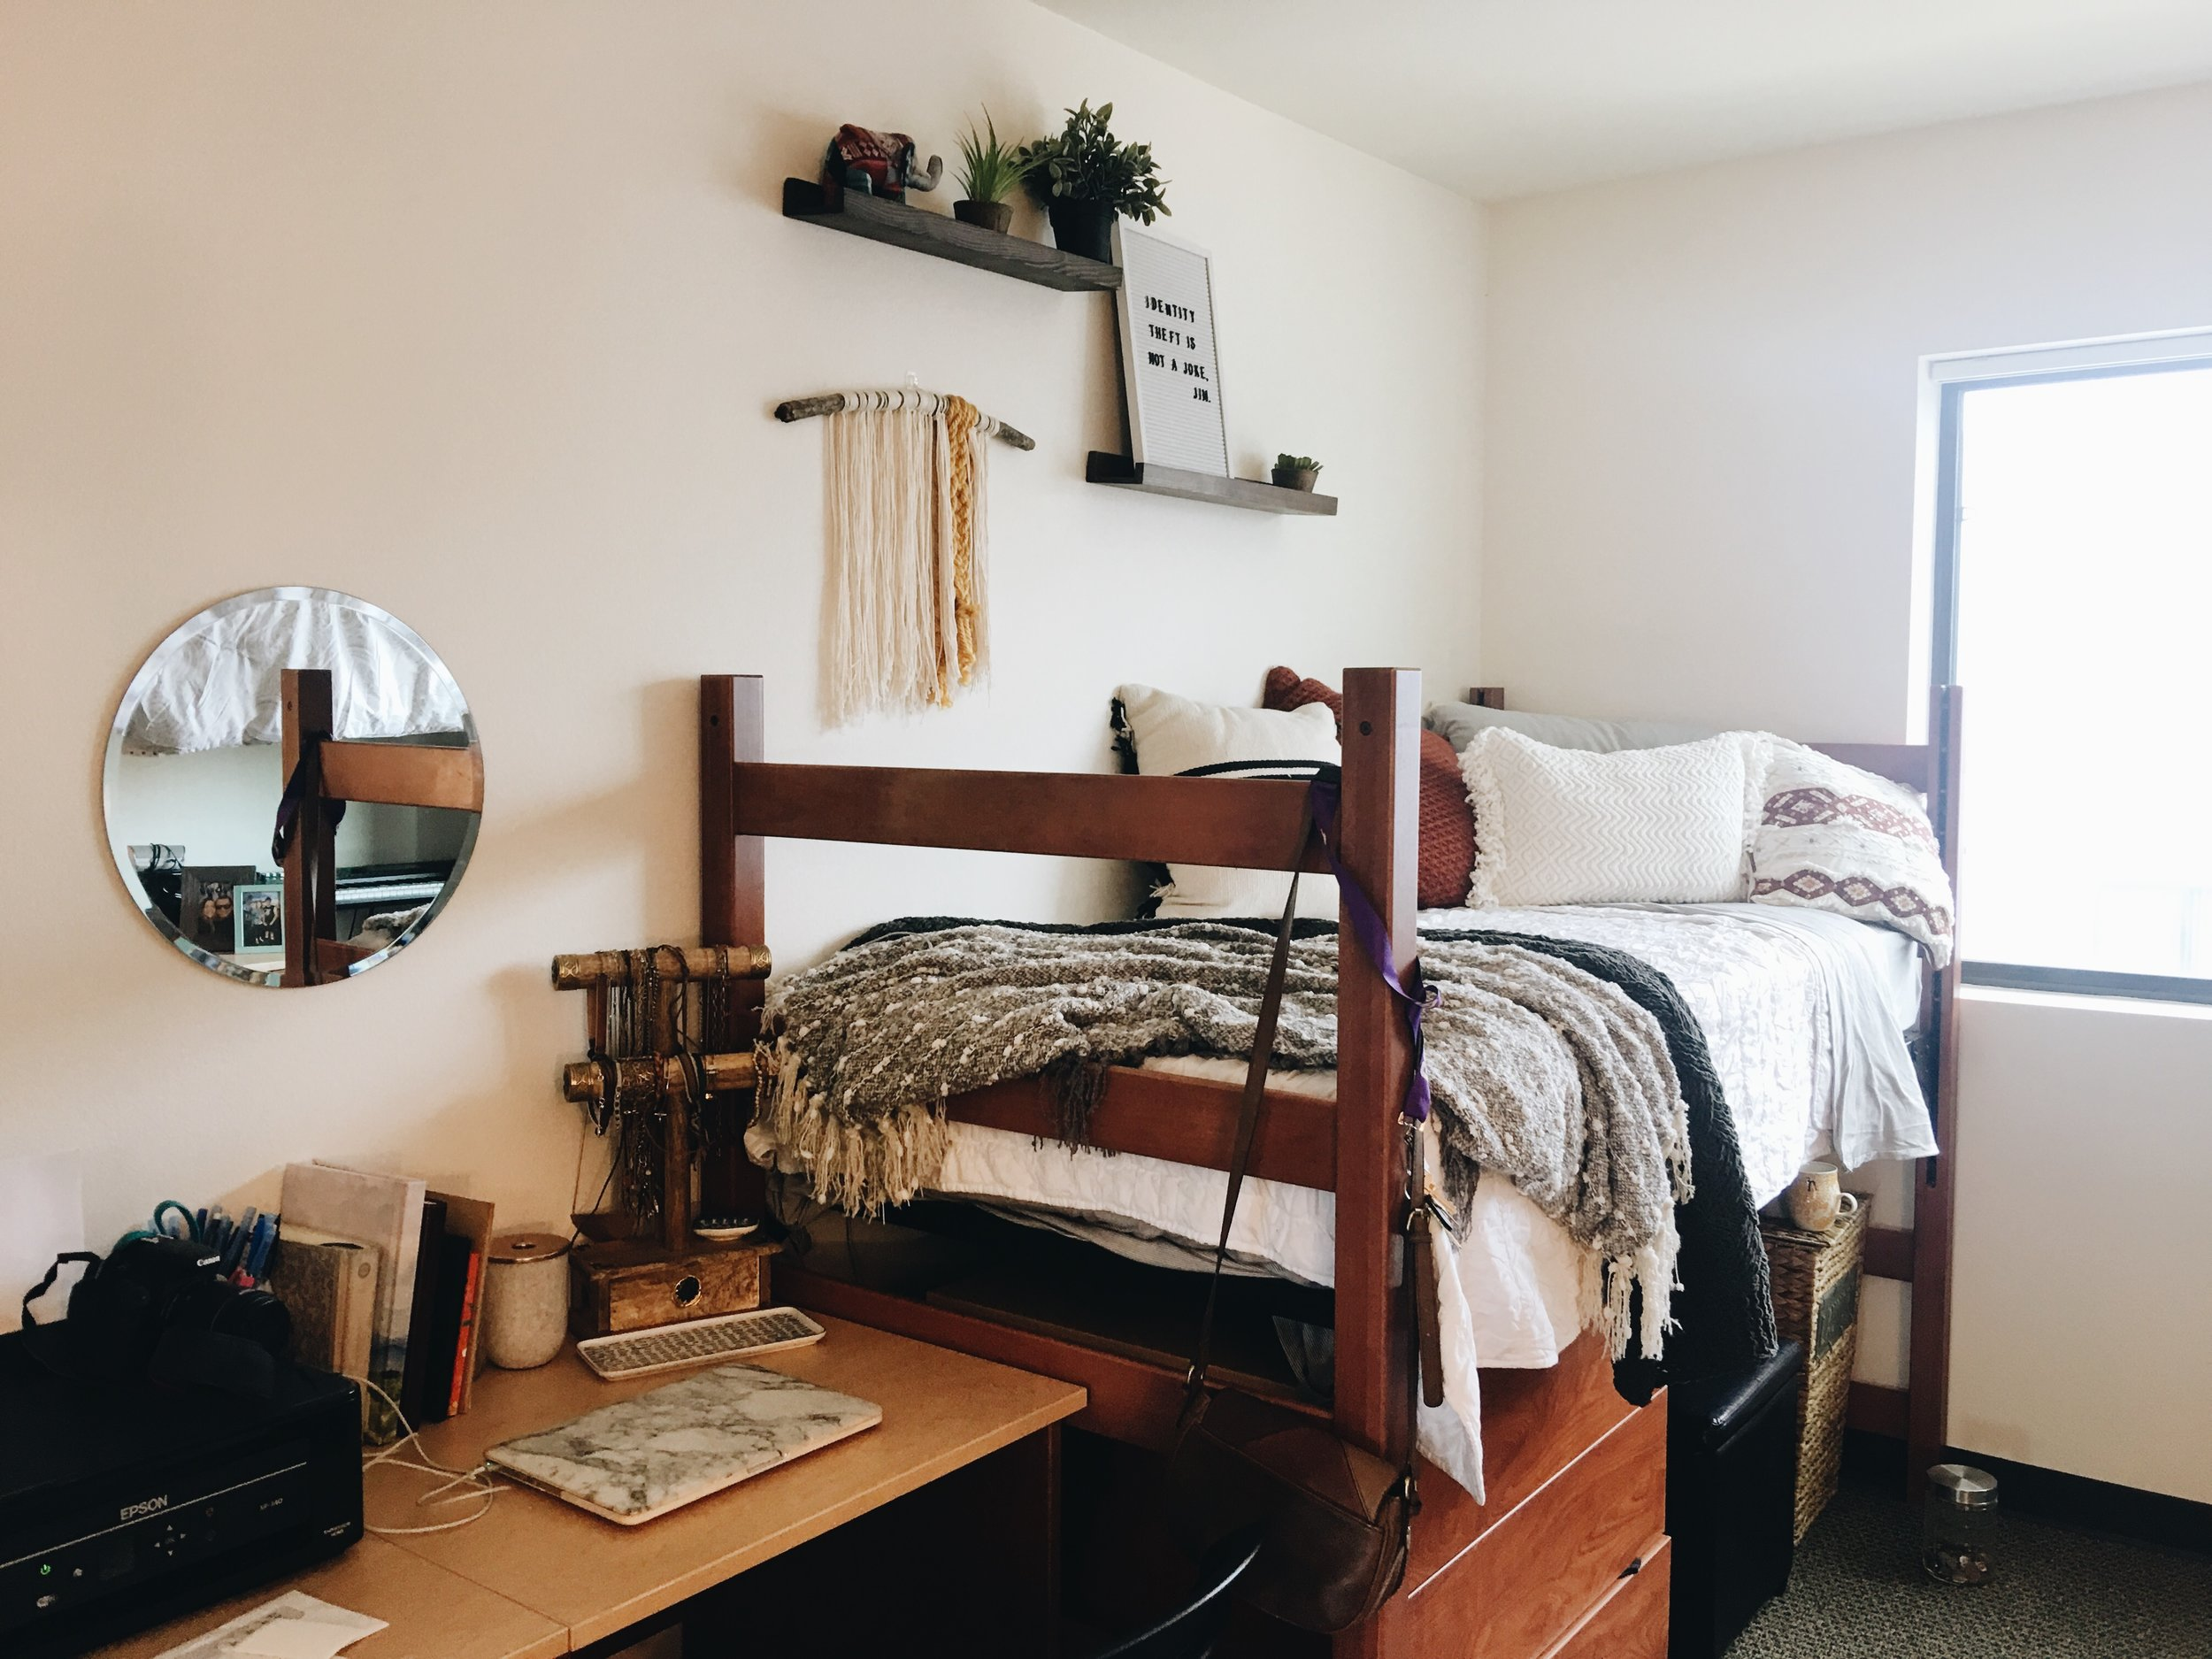 College Dorm Room Decor Han Elaine